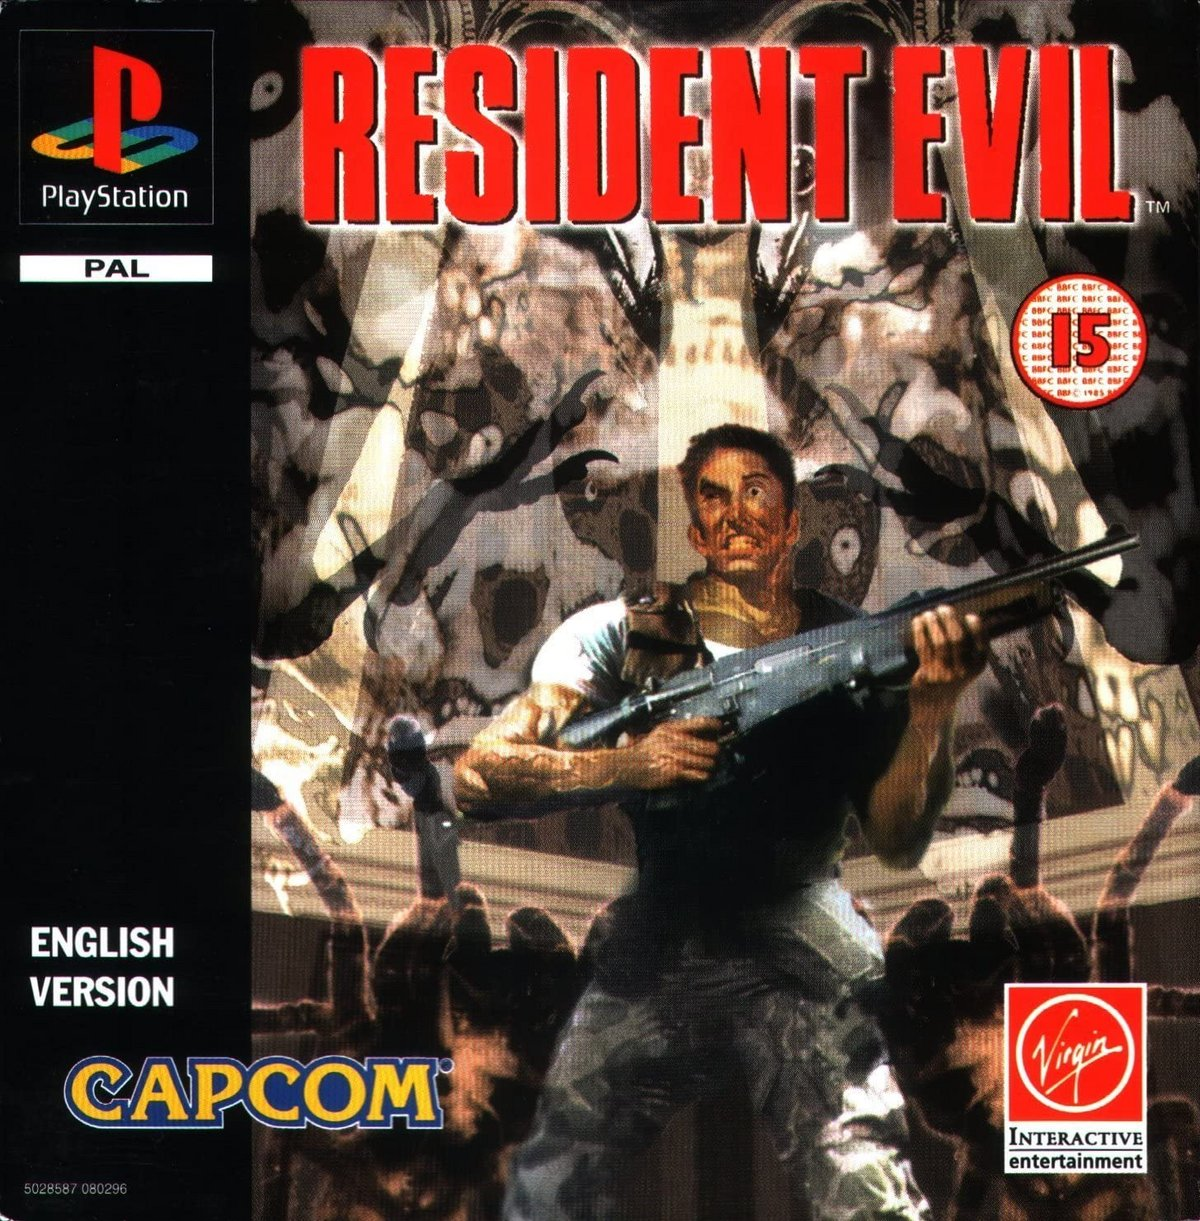 Resident evil © Capcom / Sony